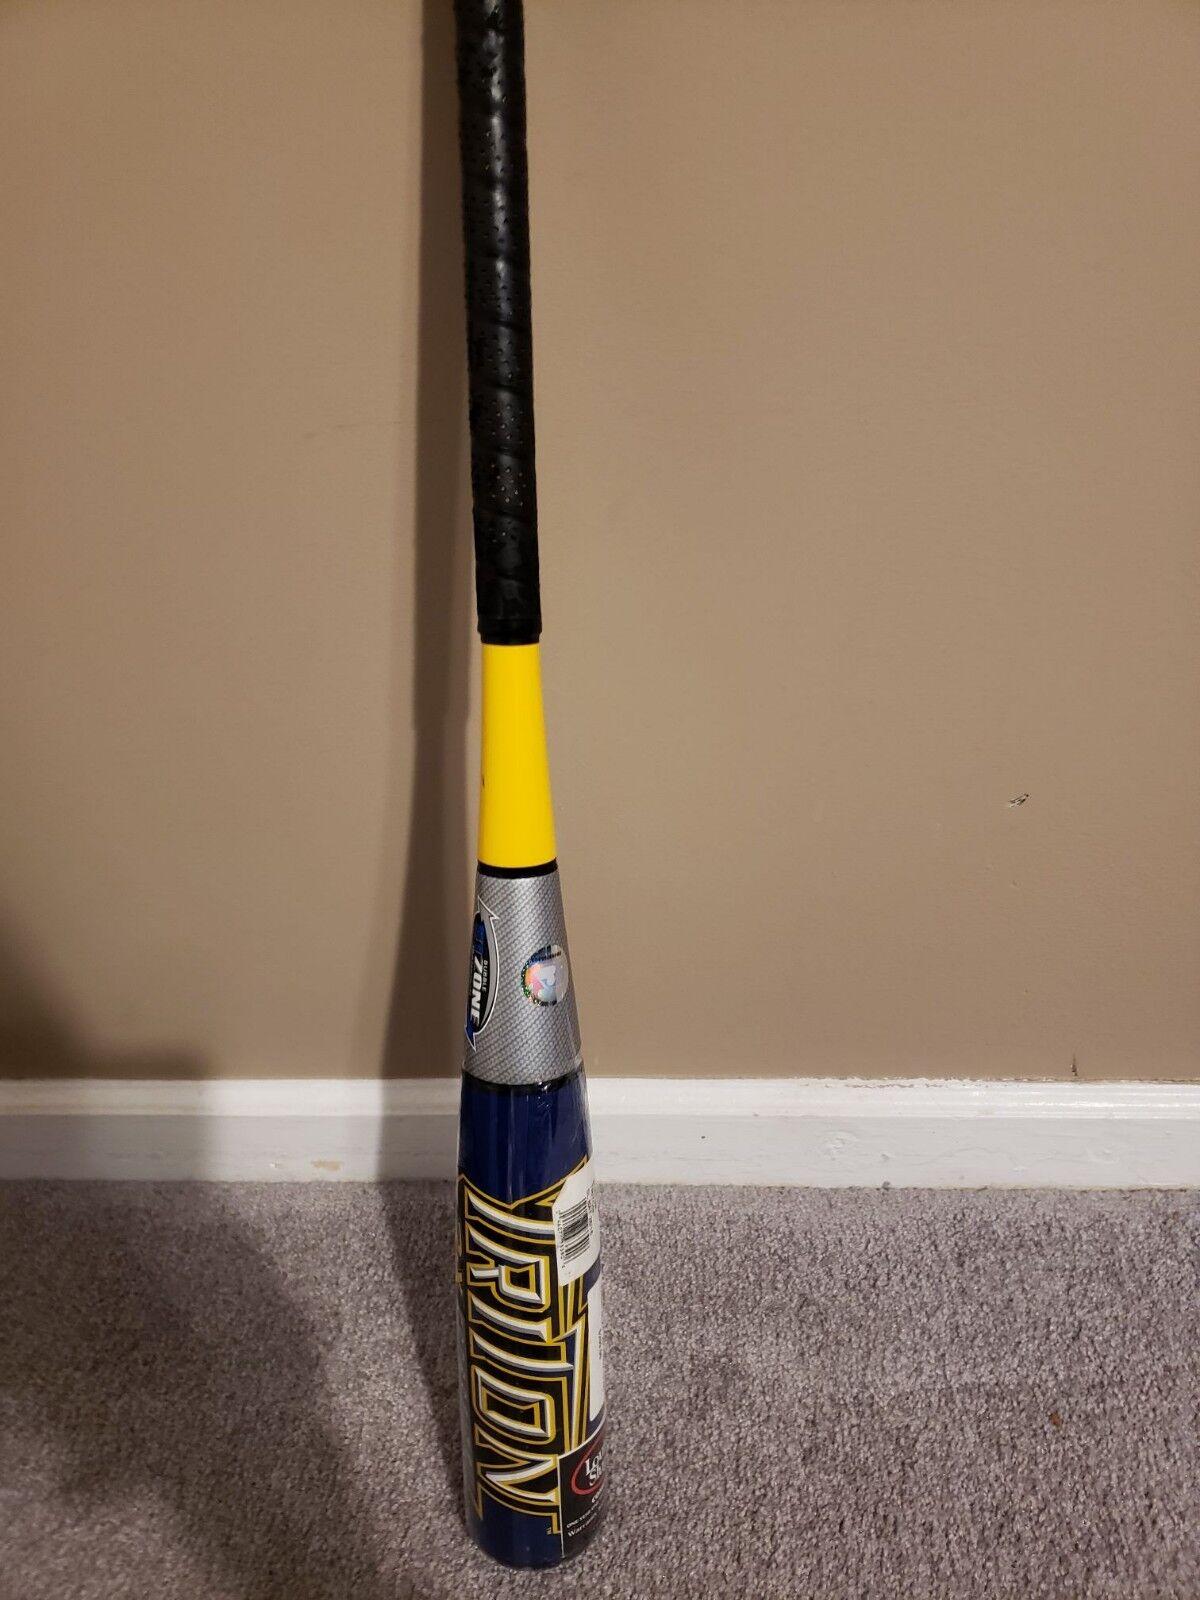 Louisville Triton Senior League Bat SLXT 29  19oz. Drop 10 New w Warranty